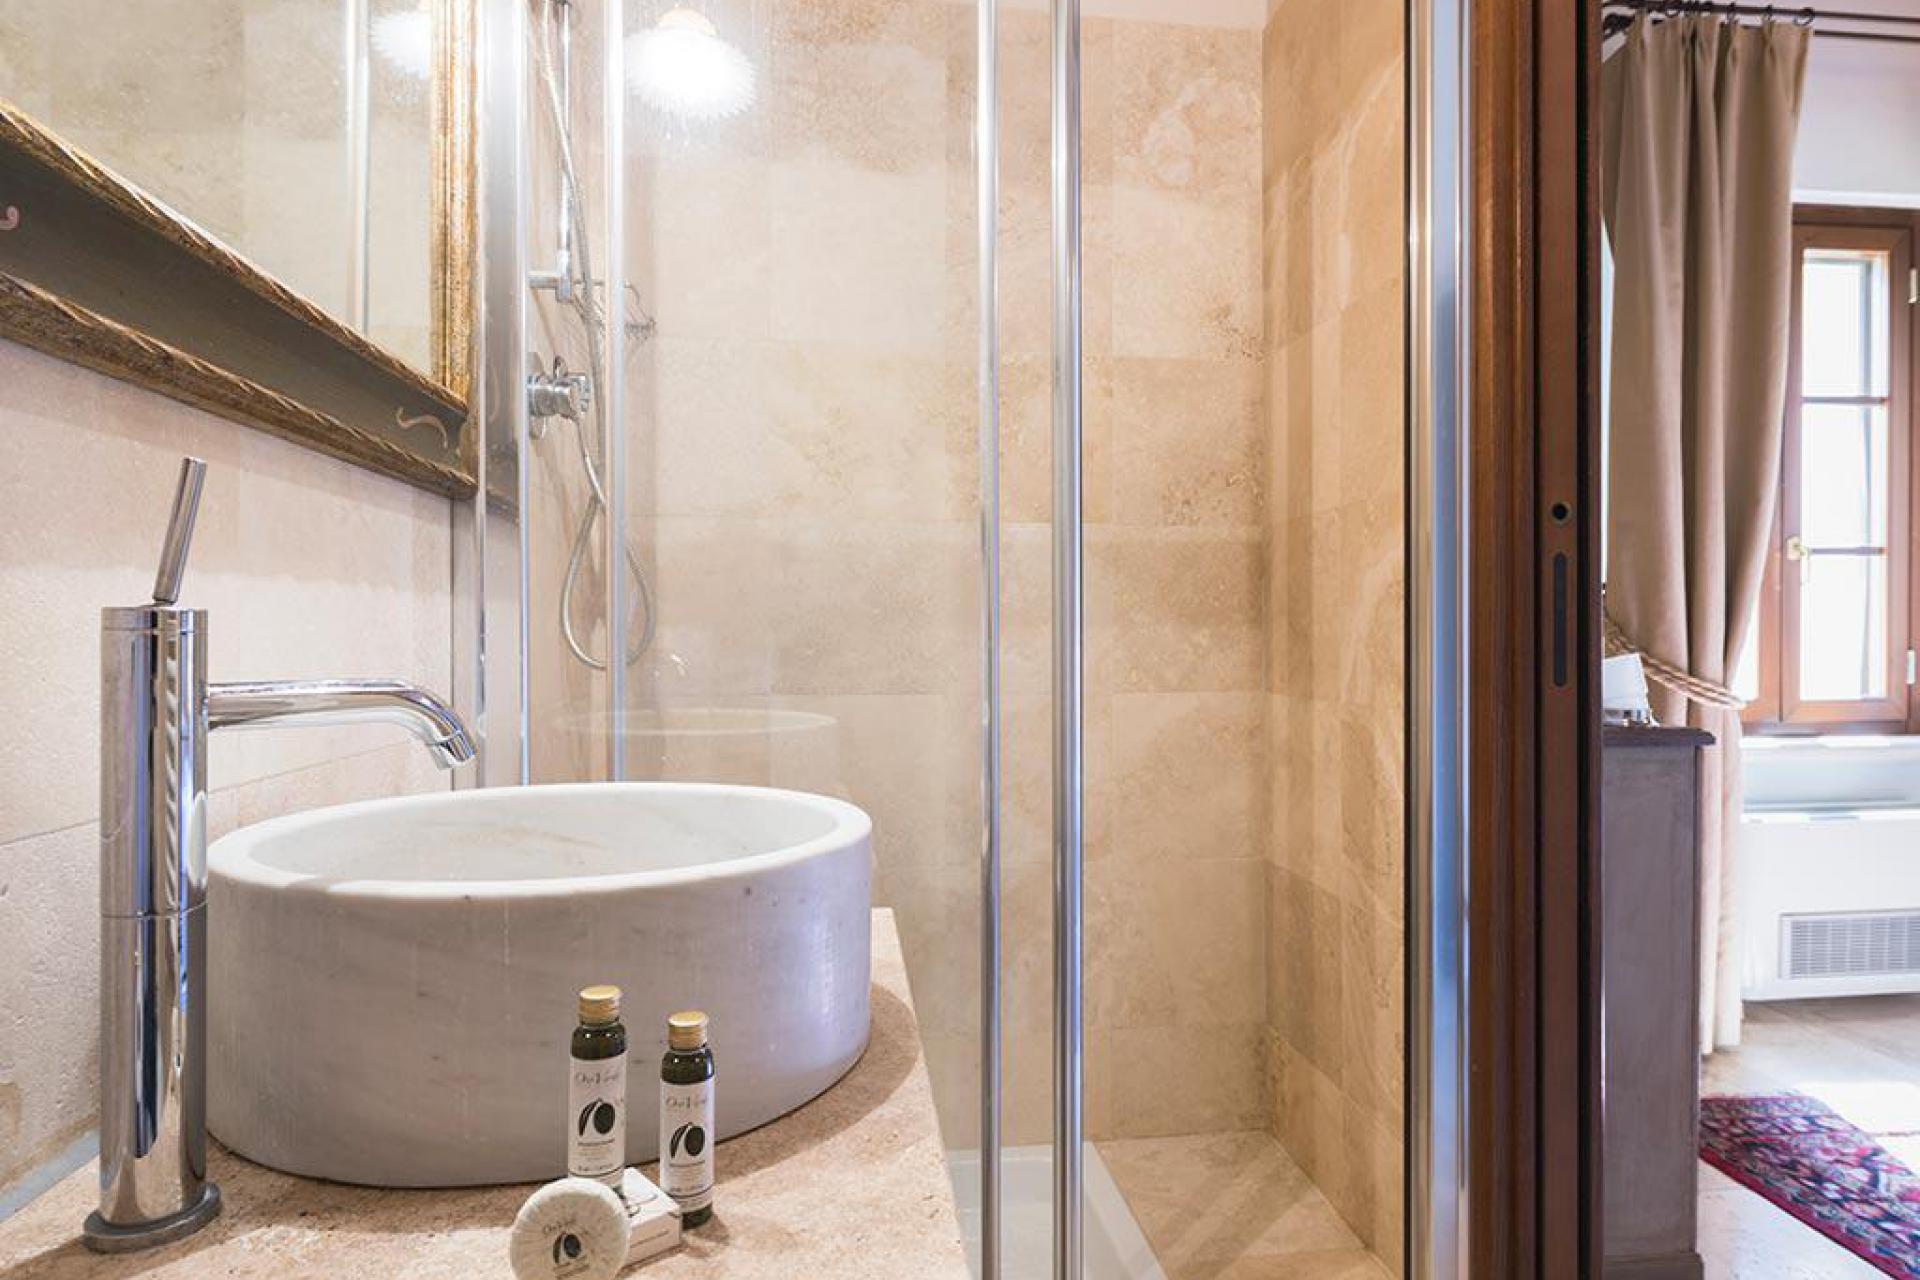 Agriturismo Tuscany Luxury agriturismo between Siena and Arezzo in Tuscany